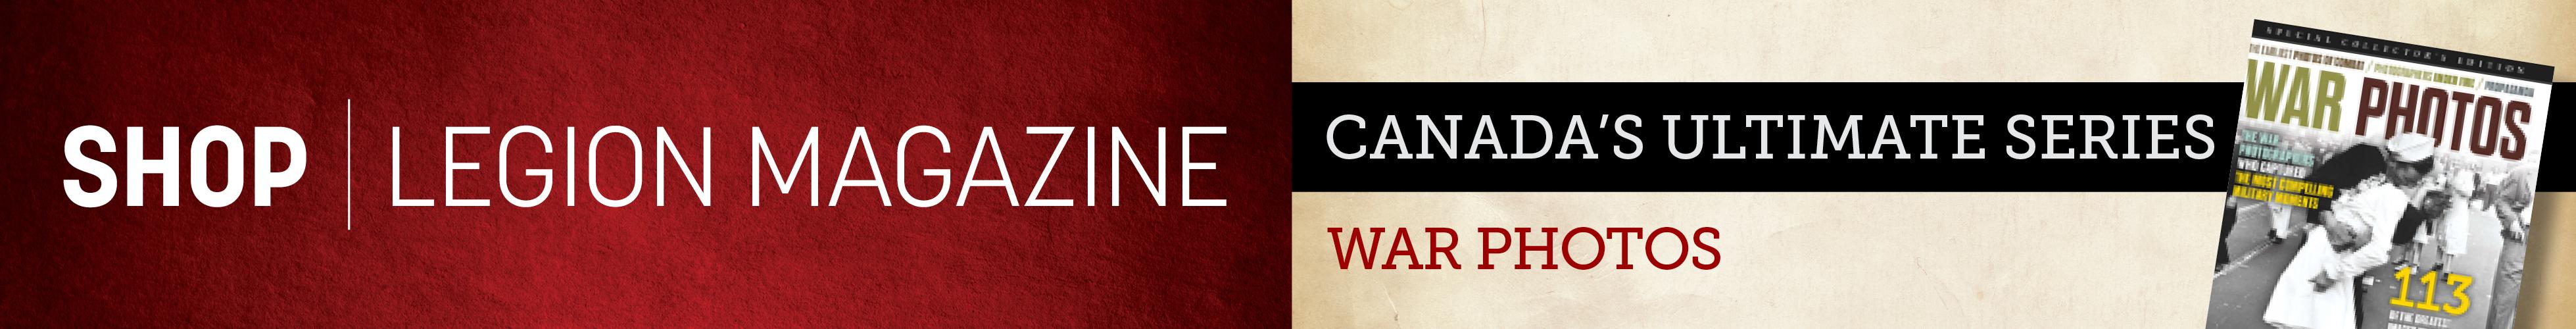 war_photos_leaderboard